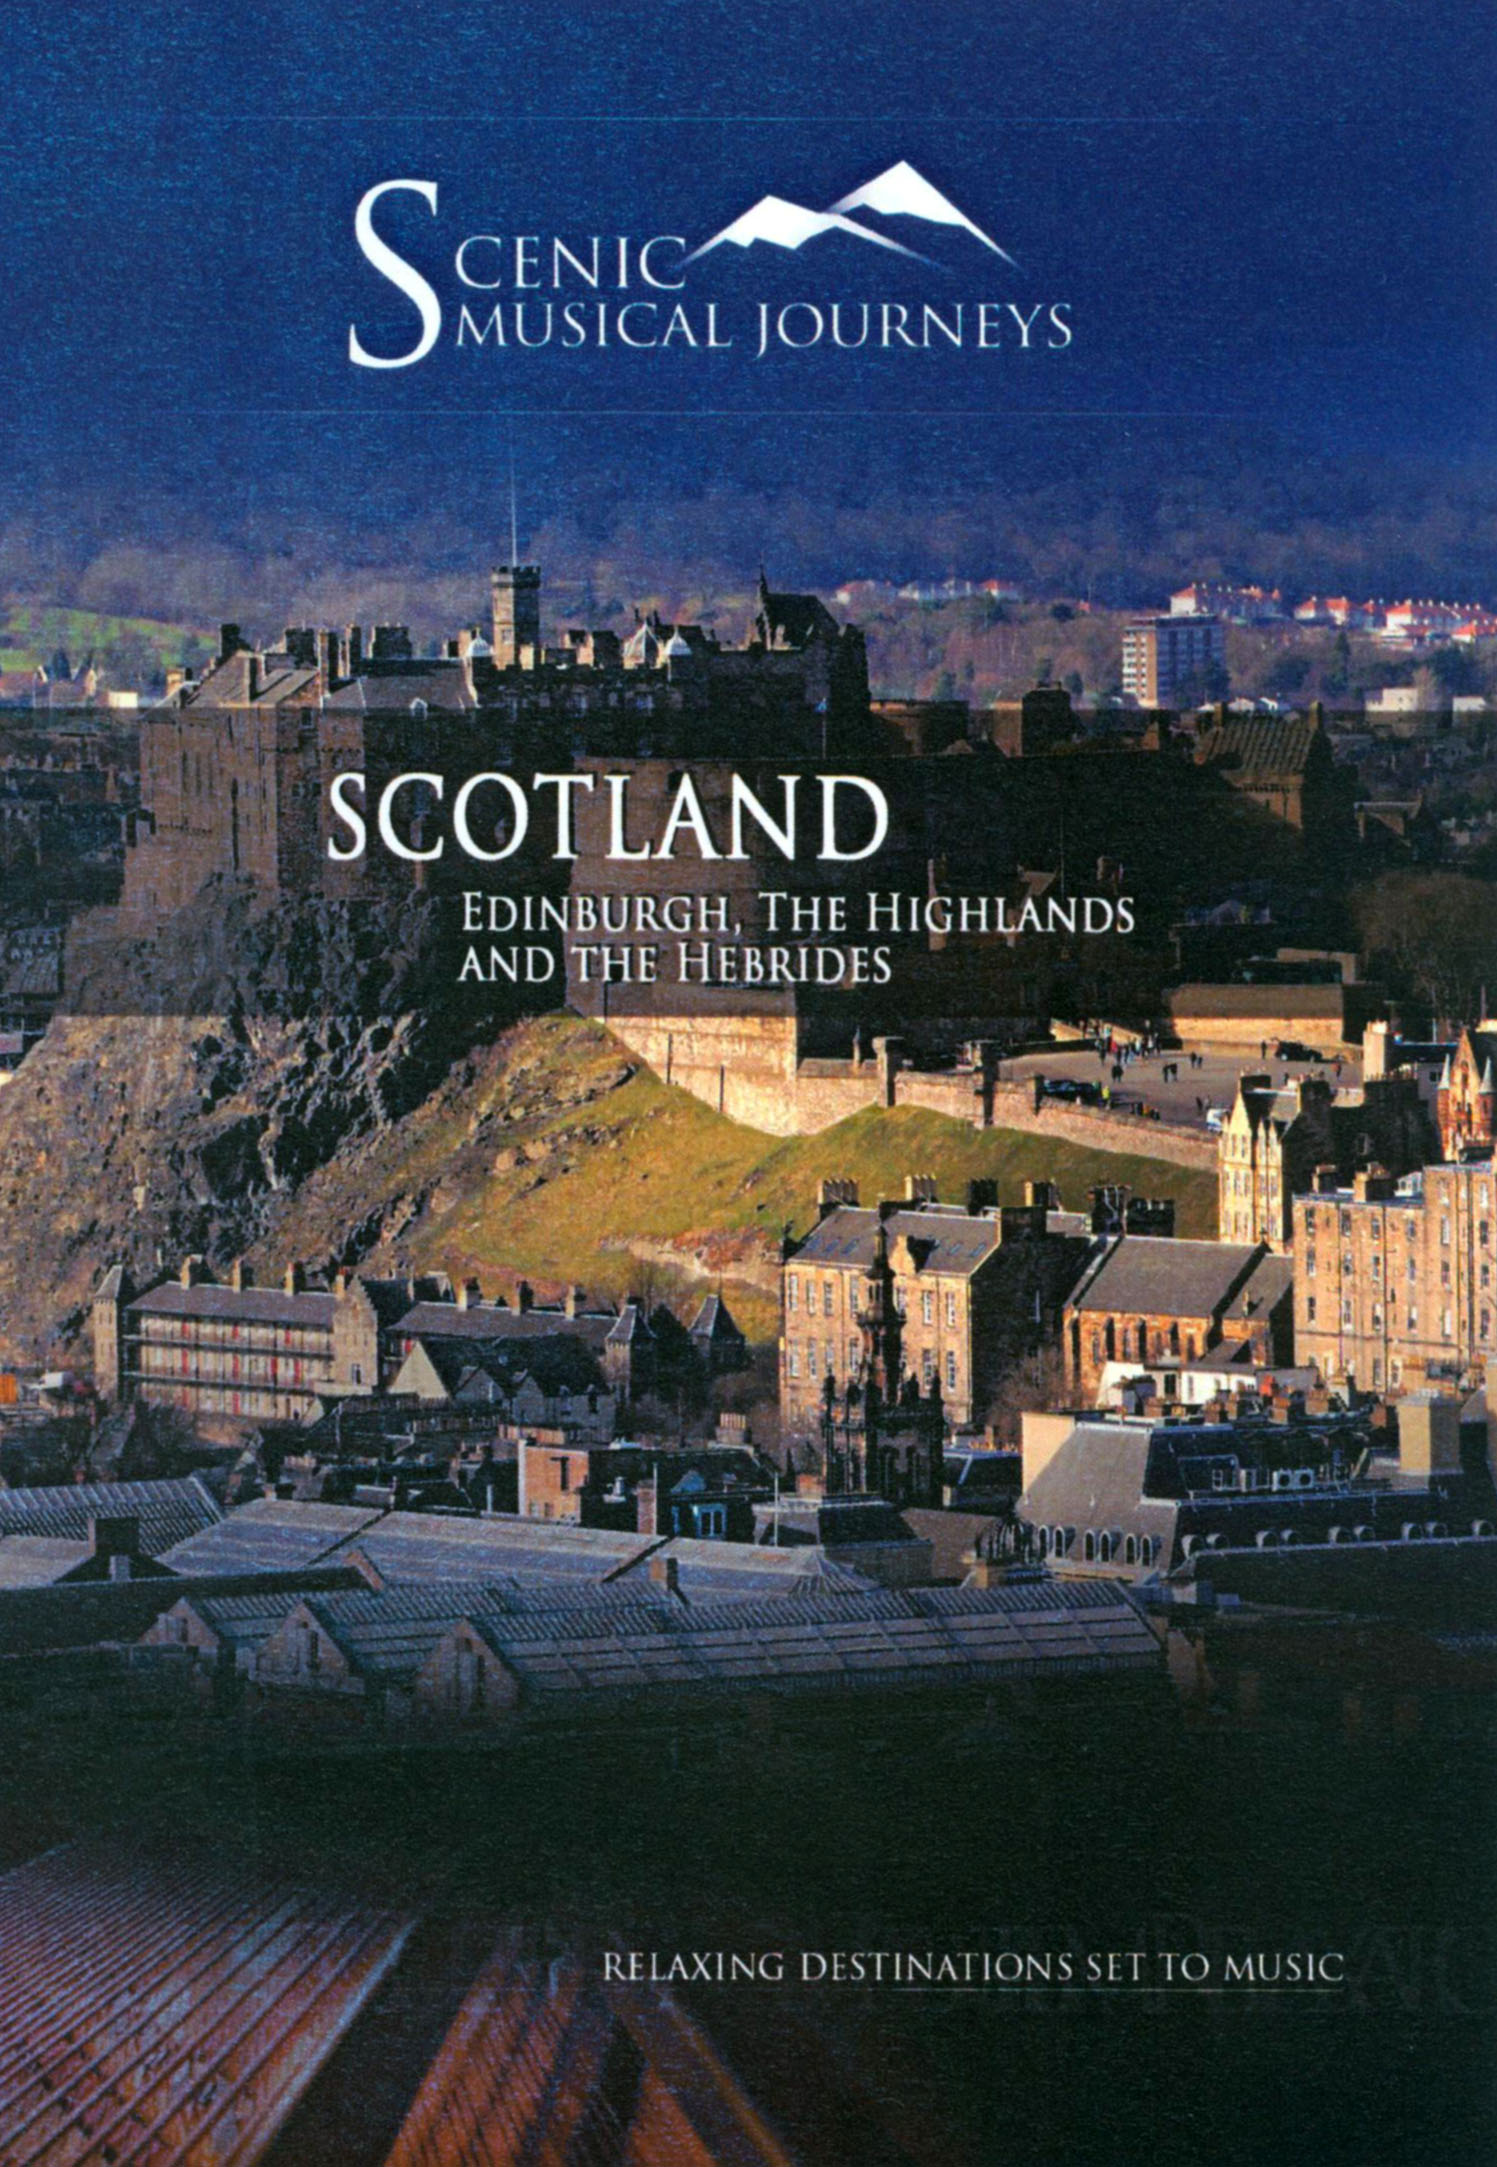 Scenic Musical Journeys: Scotland - Edinburgh, The Highlands and the Hebrides